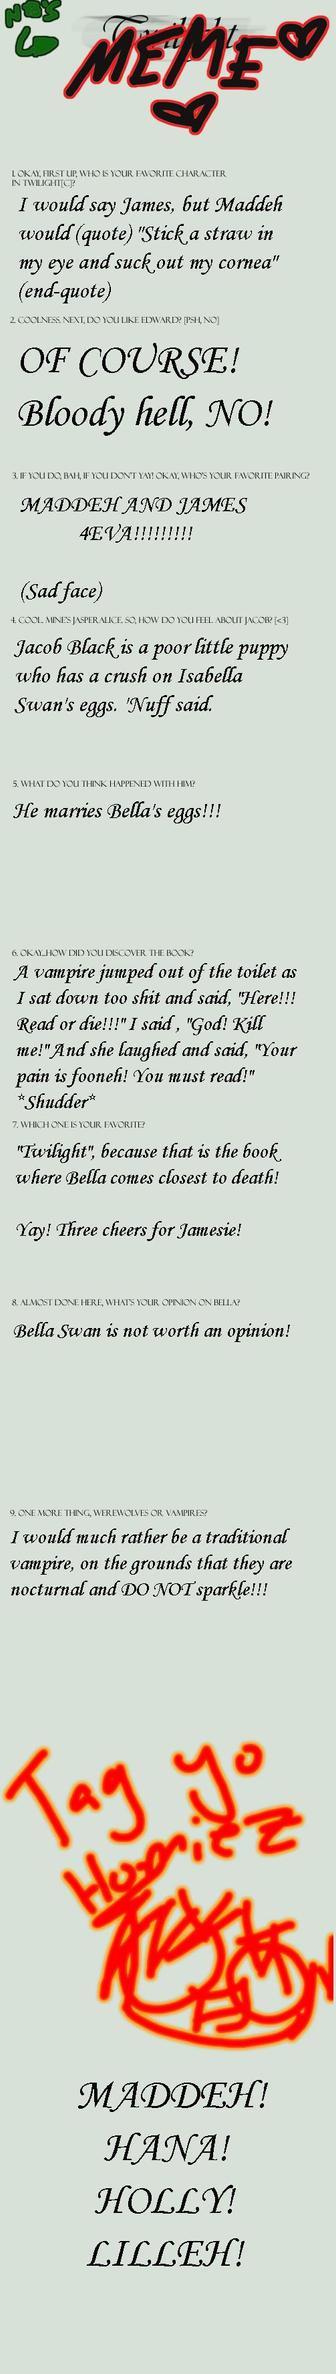 Twilight MEME - Dora Version by Isadora-Greenhall